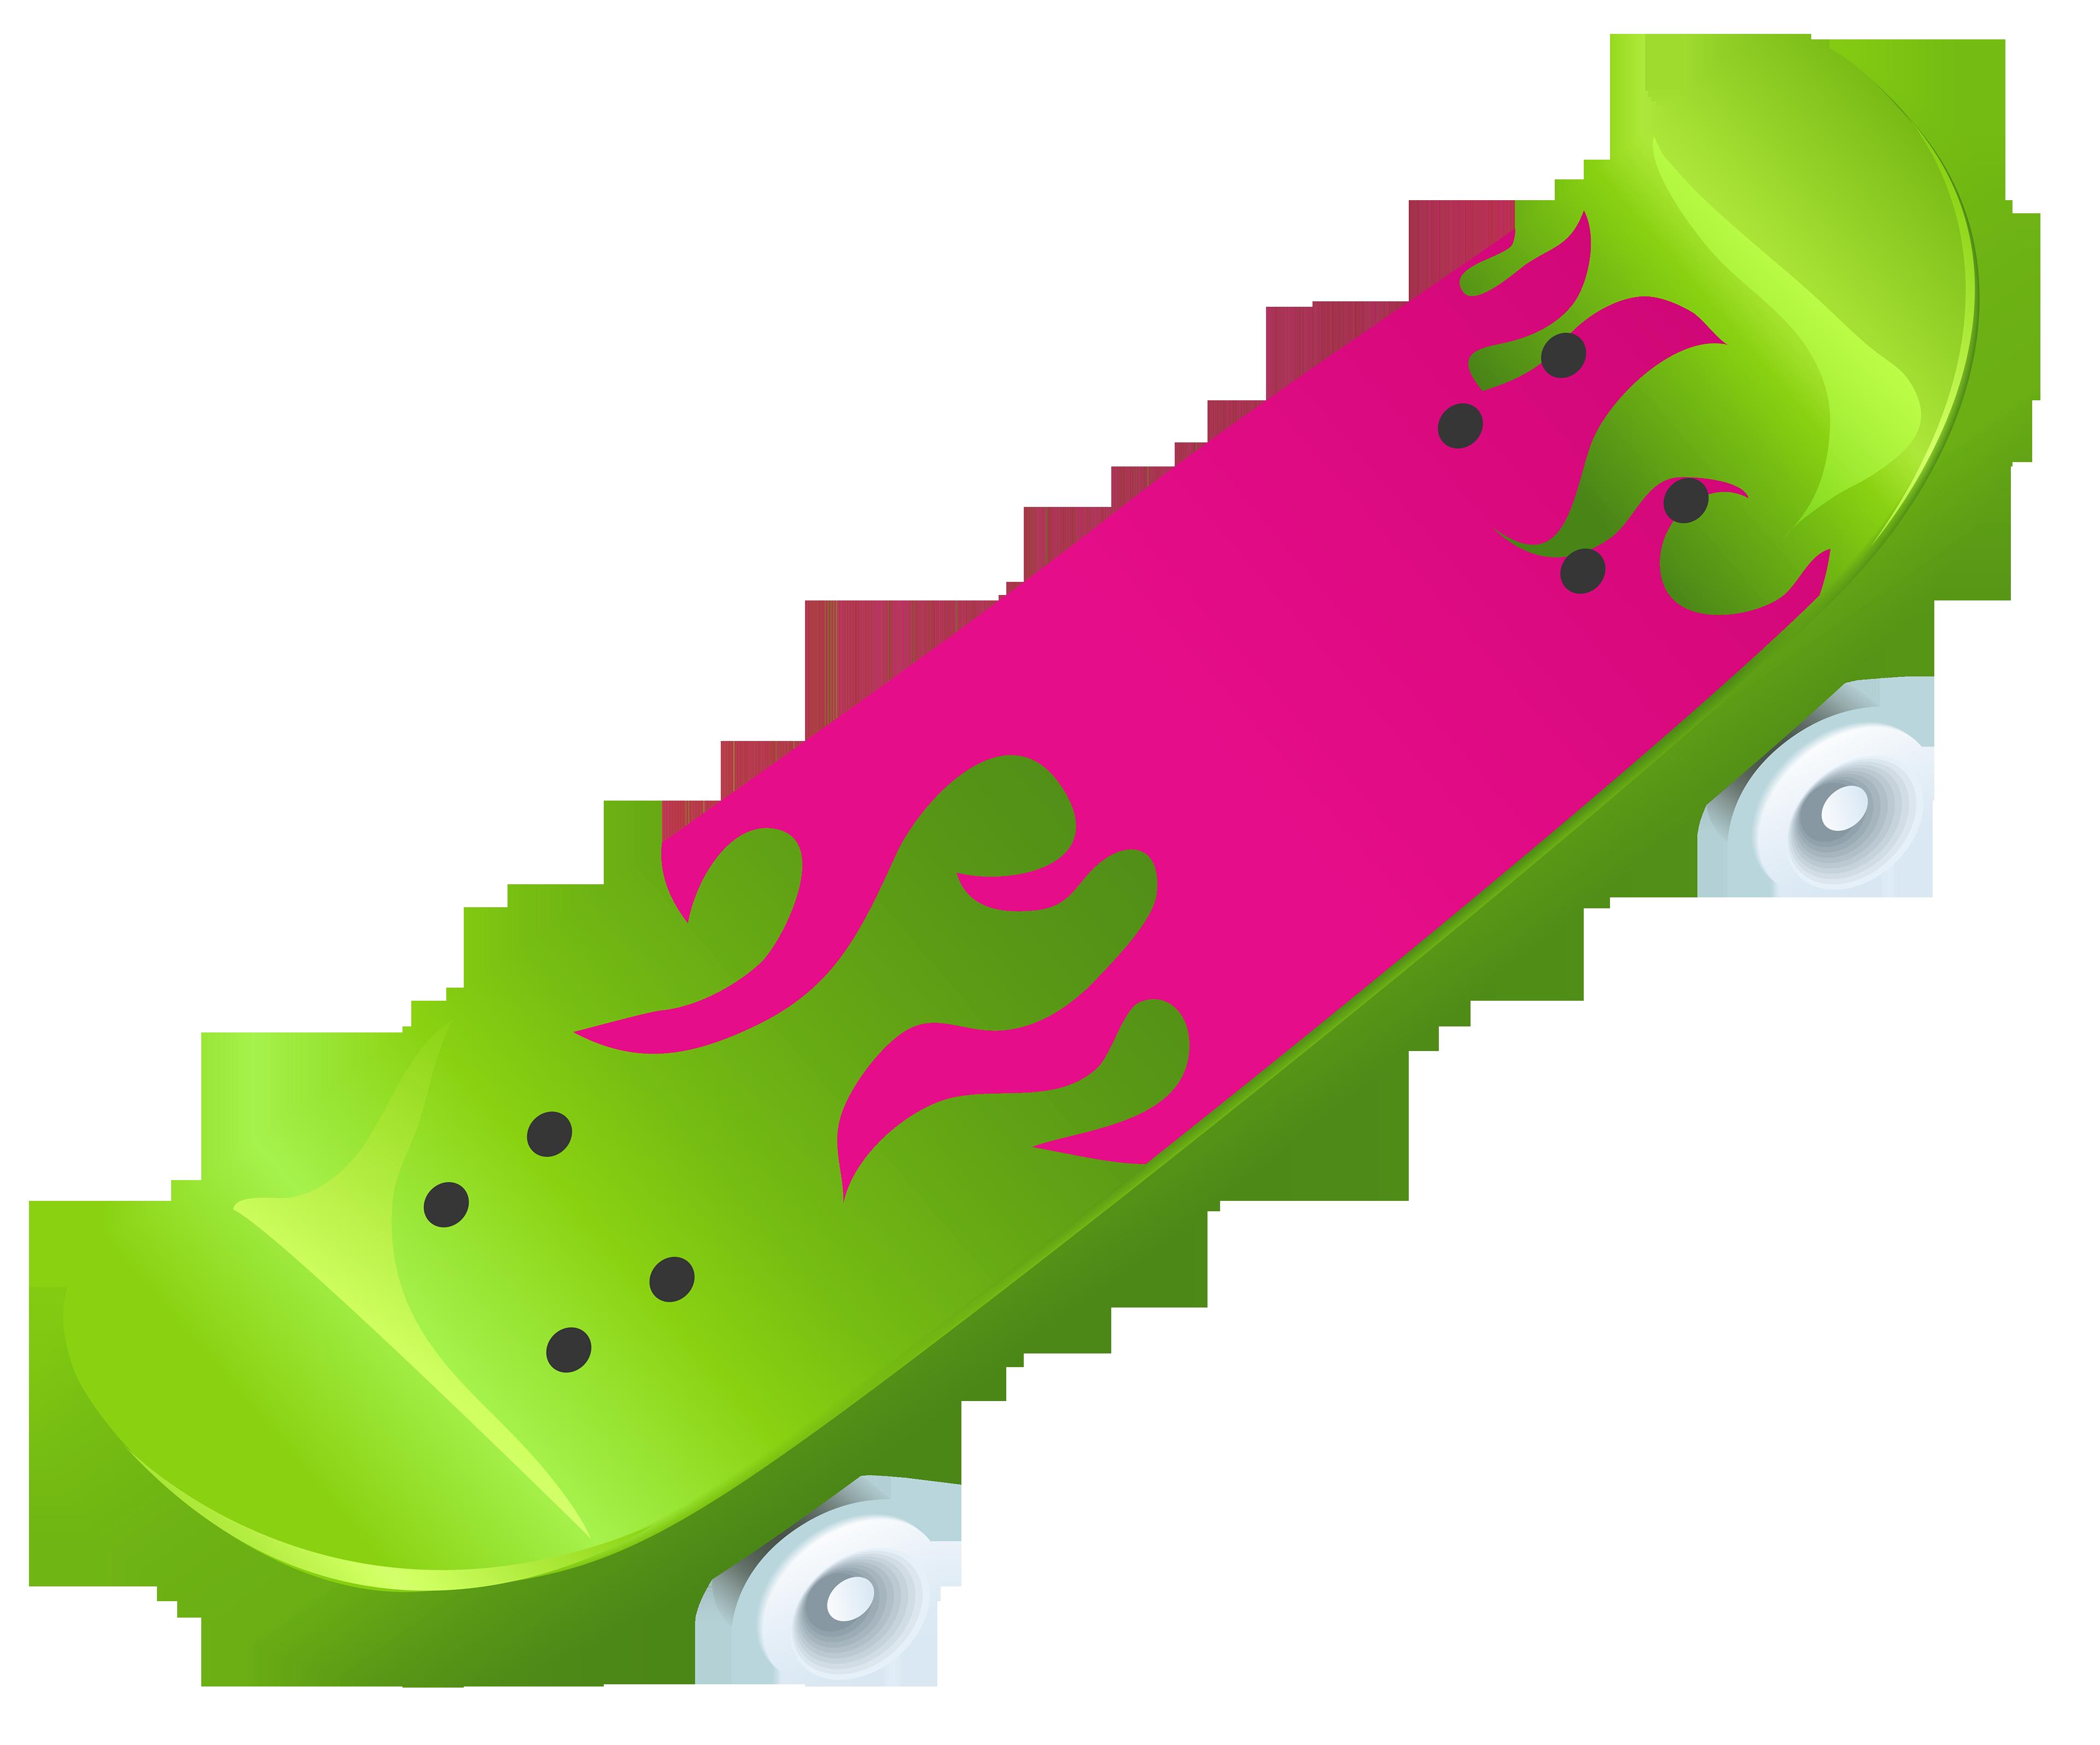 Image of skateboard clipart 8 skateboard 2 clip art at vector 2